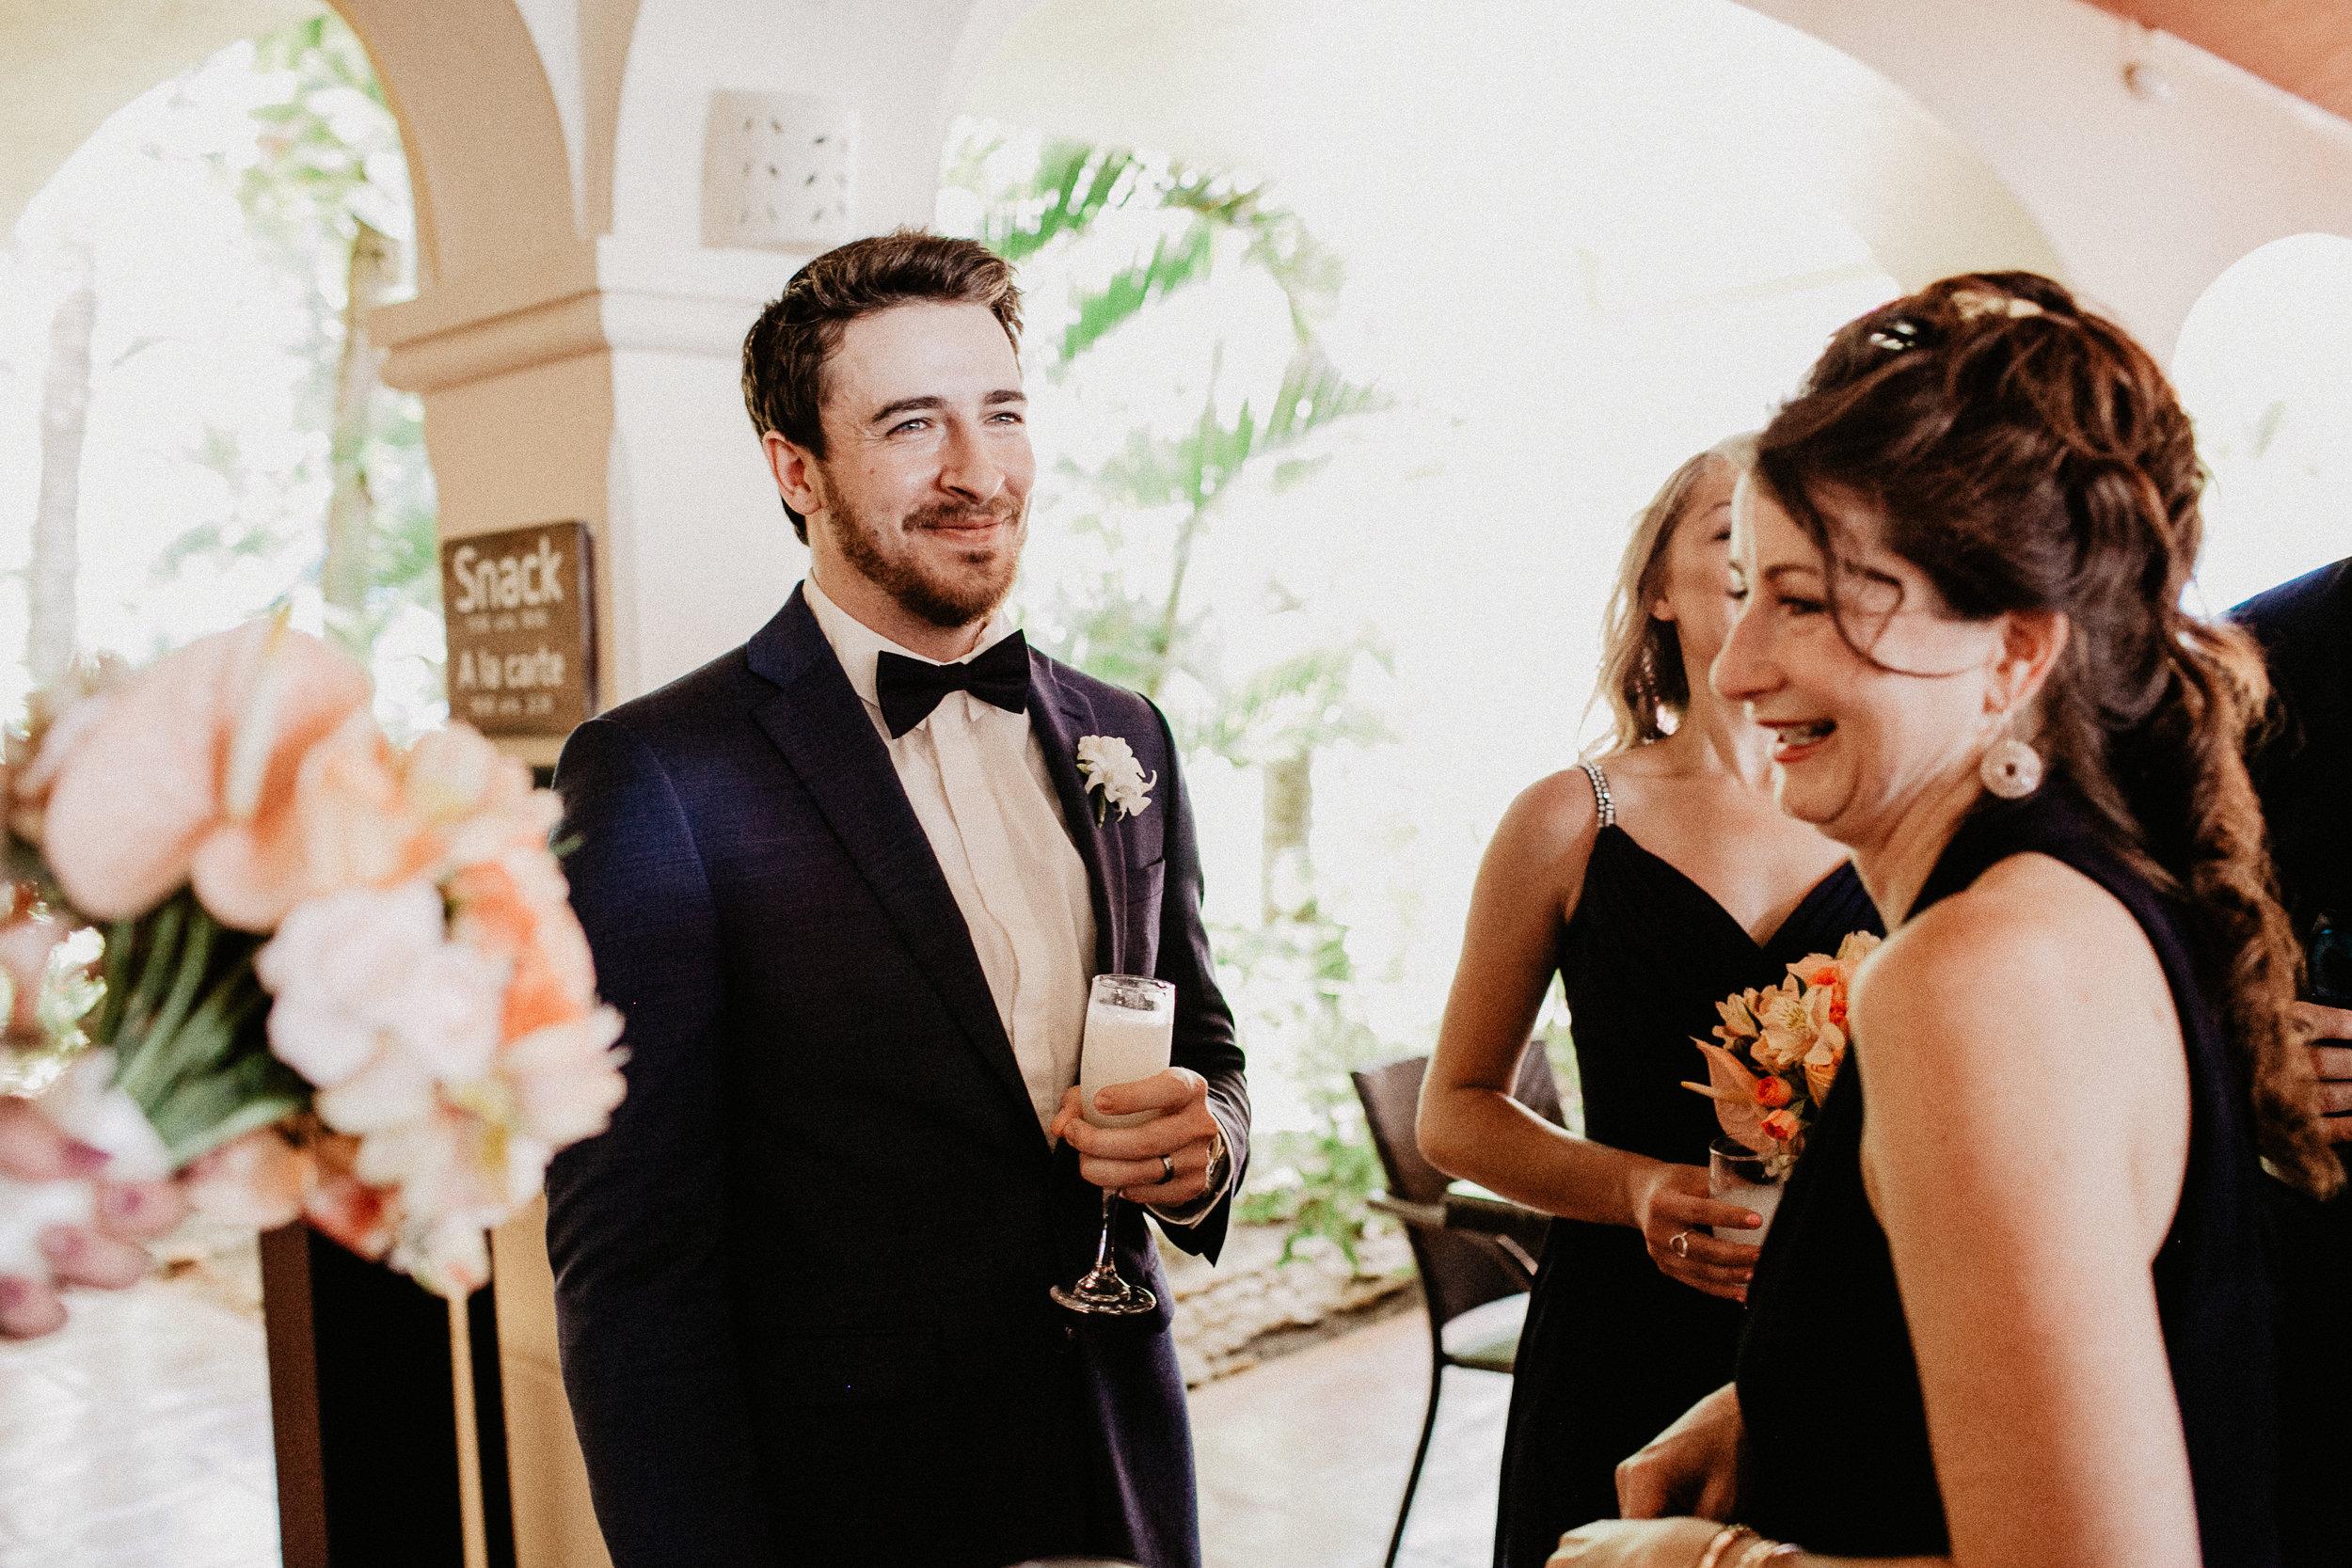 alfonso_flores_destination_wedding_photography_puerto_vallarta_hotel_barcelo_vallarta_cuttler_amela-271.JPG